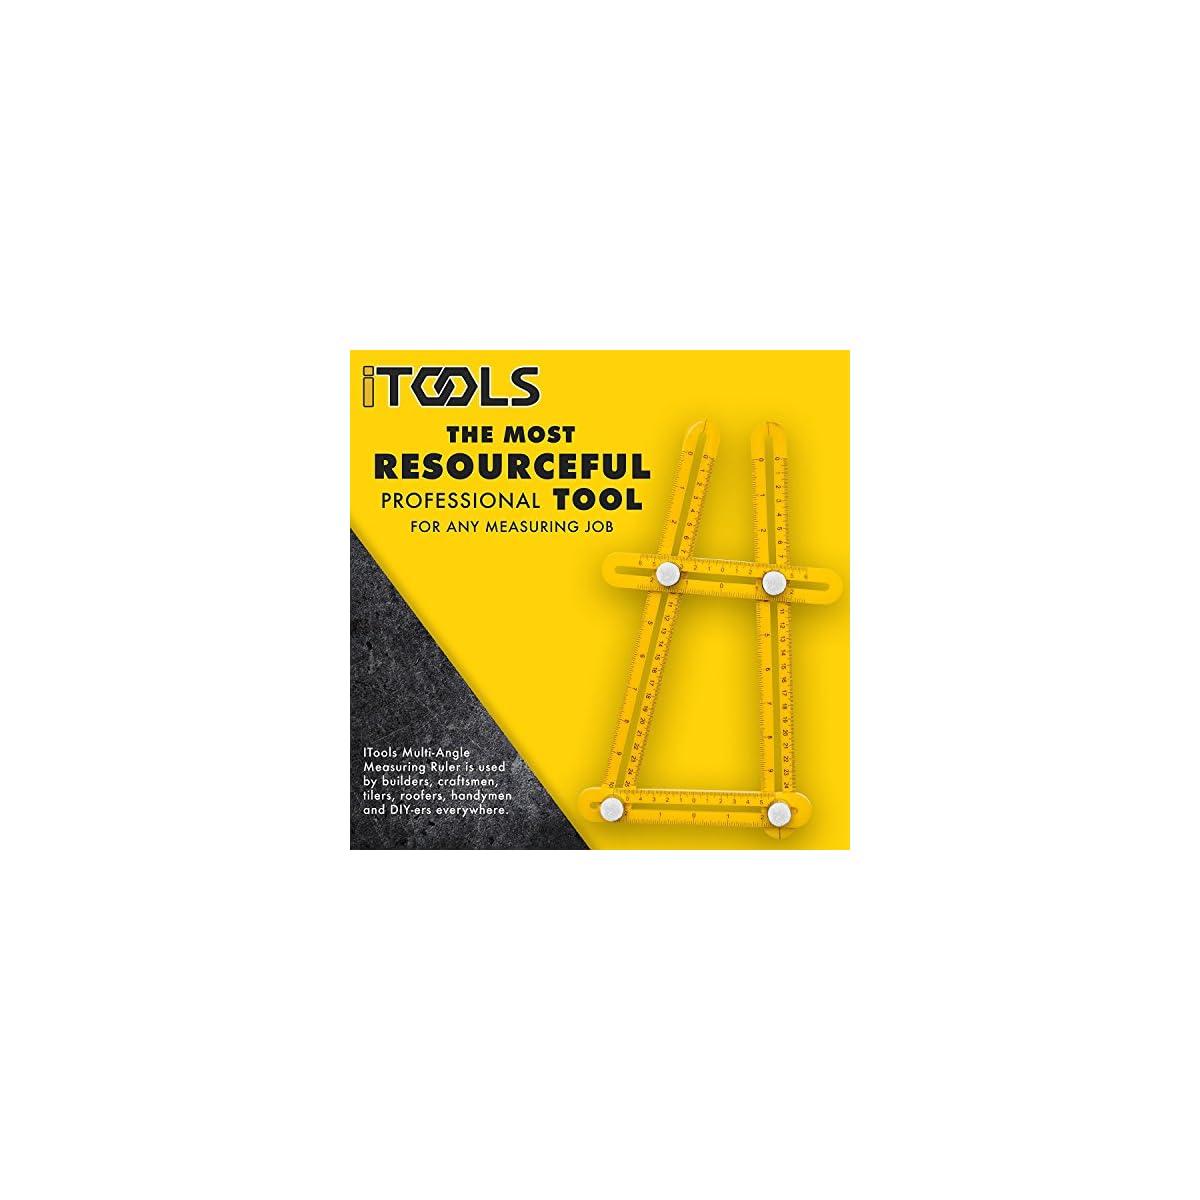 Itools Multi Angle Template Tool Angle Izer Measuring Ruler Layout